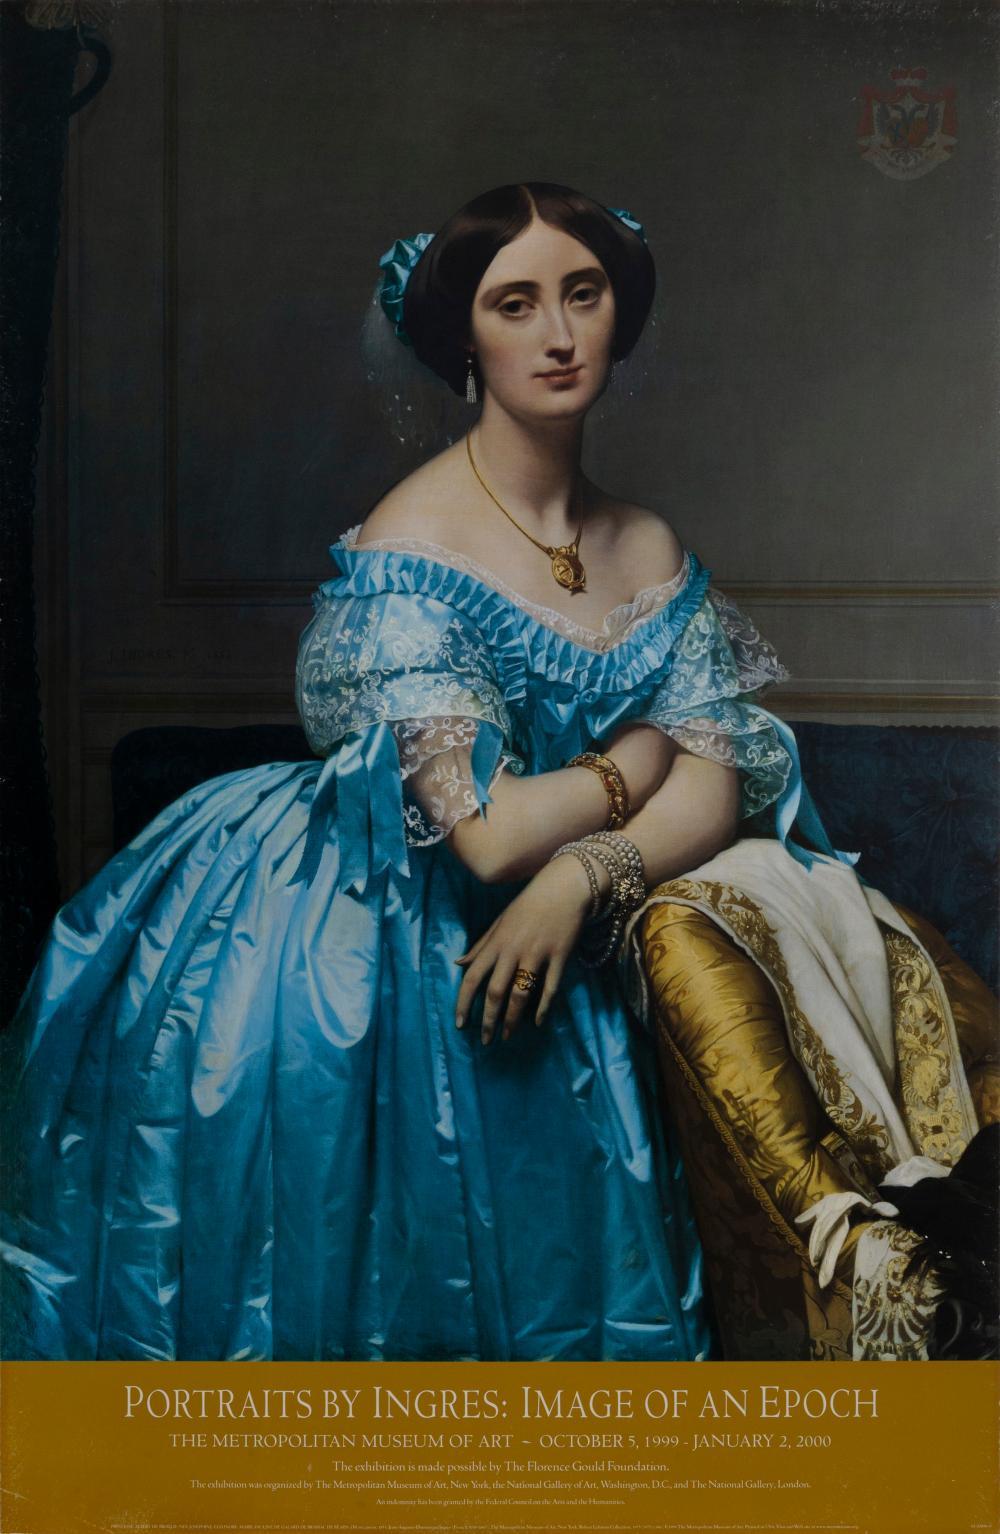 Jean-Auguste-Dominique Ingres, The Princesse de Brogile, Poster on foamcore